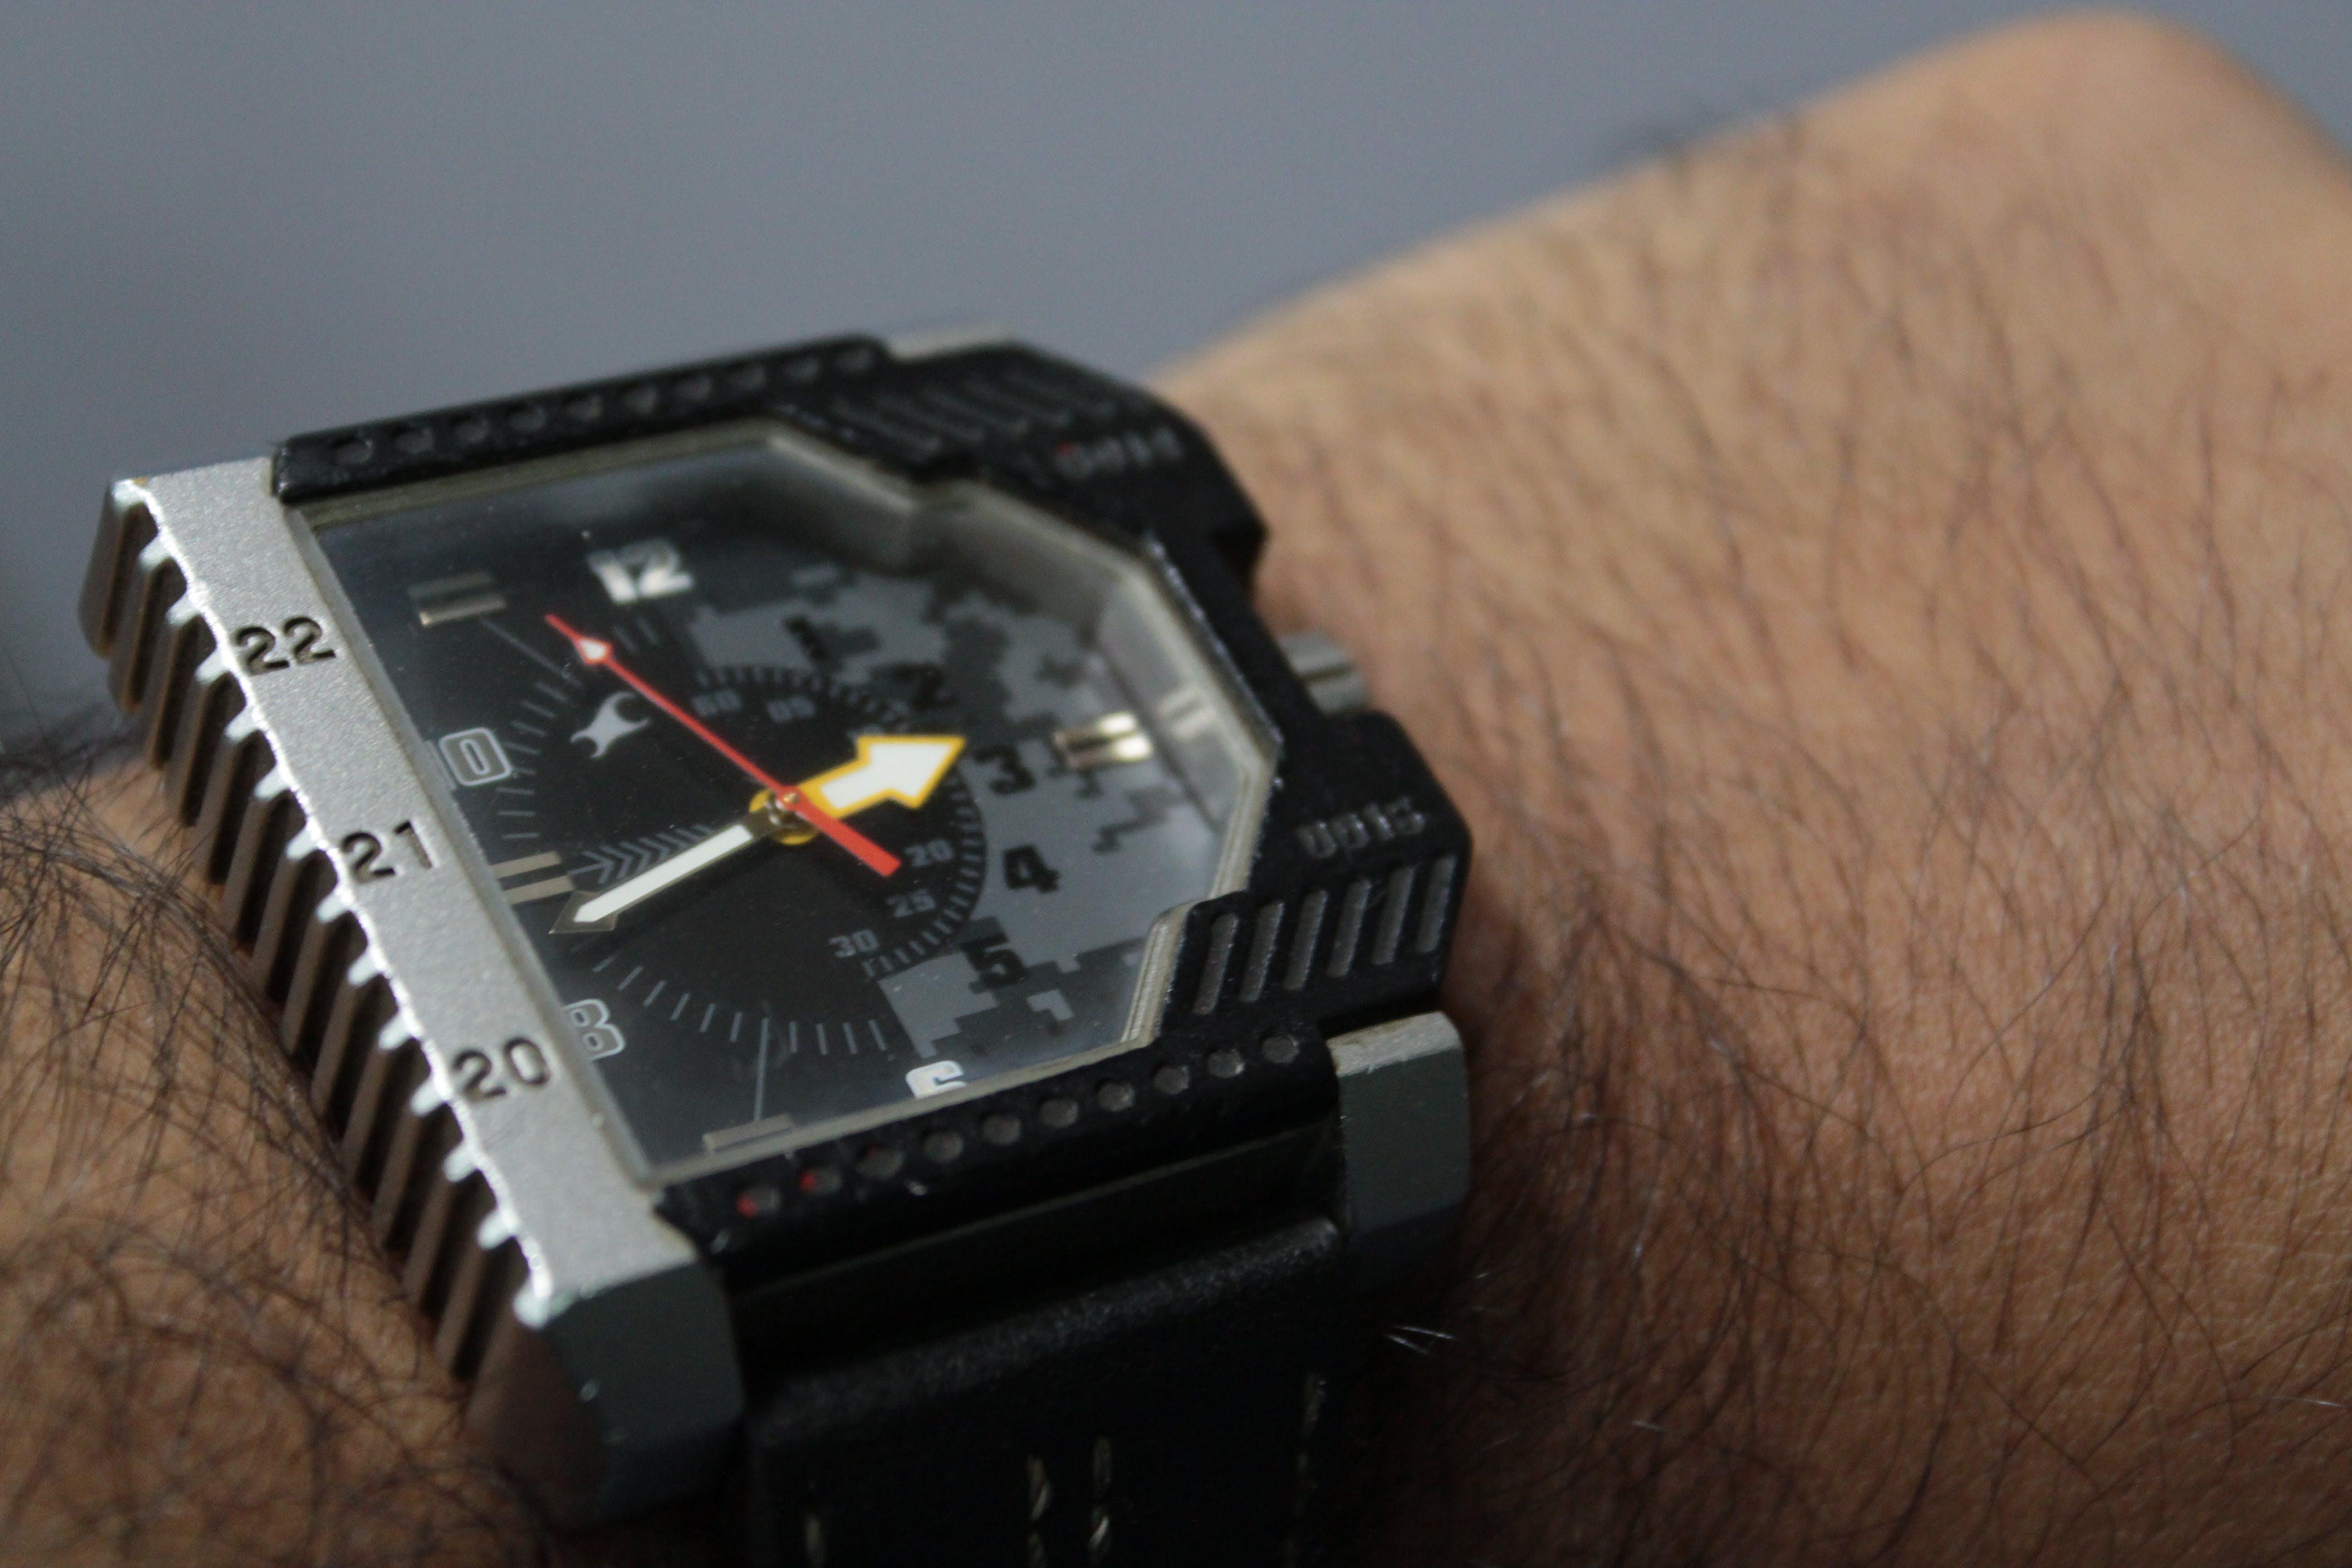 Free stock photo of clock, commando, commando watch, design